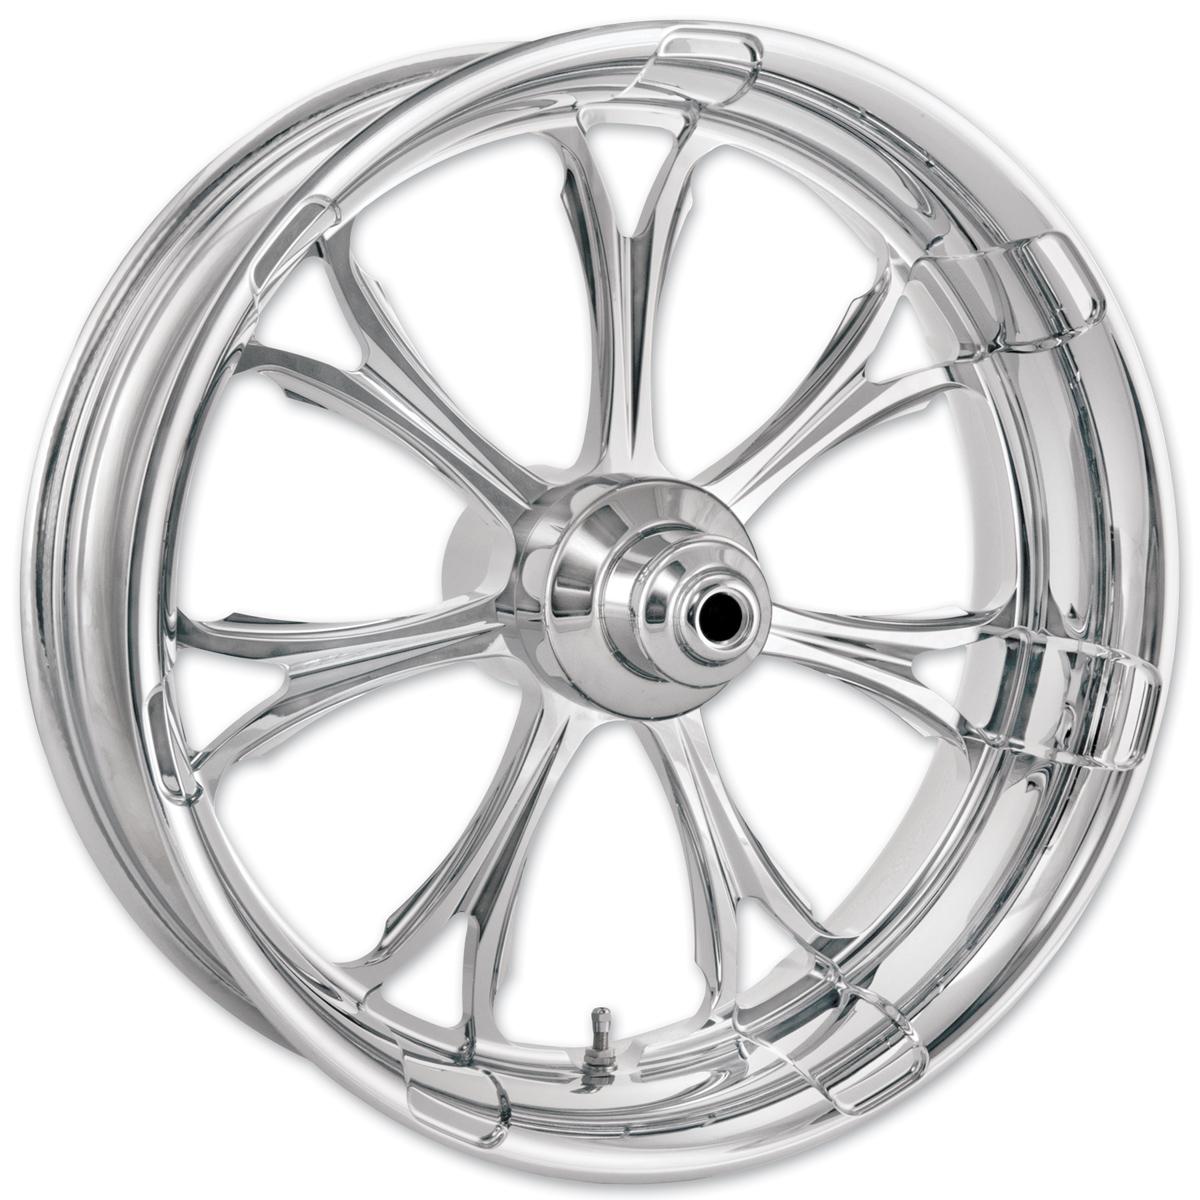 Performance Machine Paramount Chrome Front Wheel 23x3.5 ABS